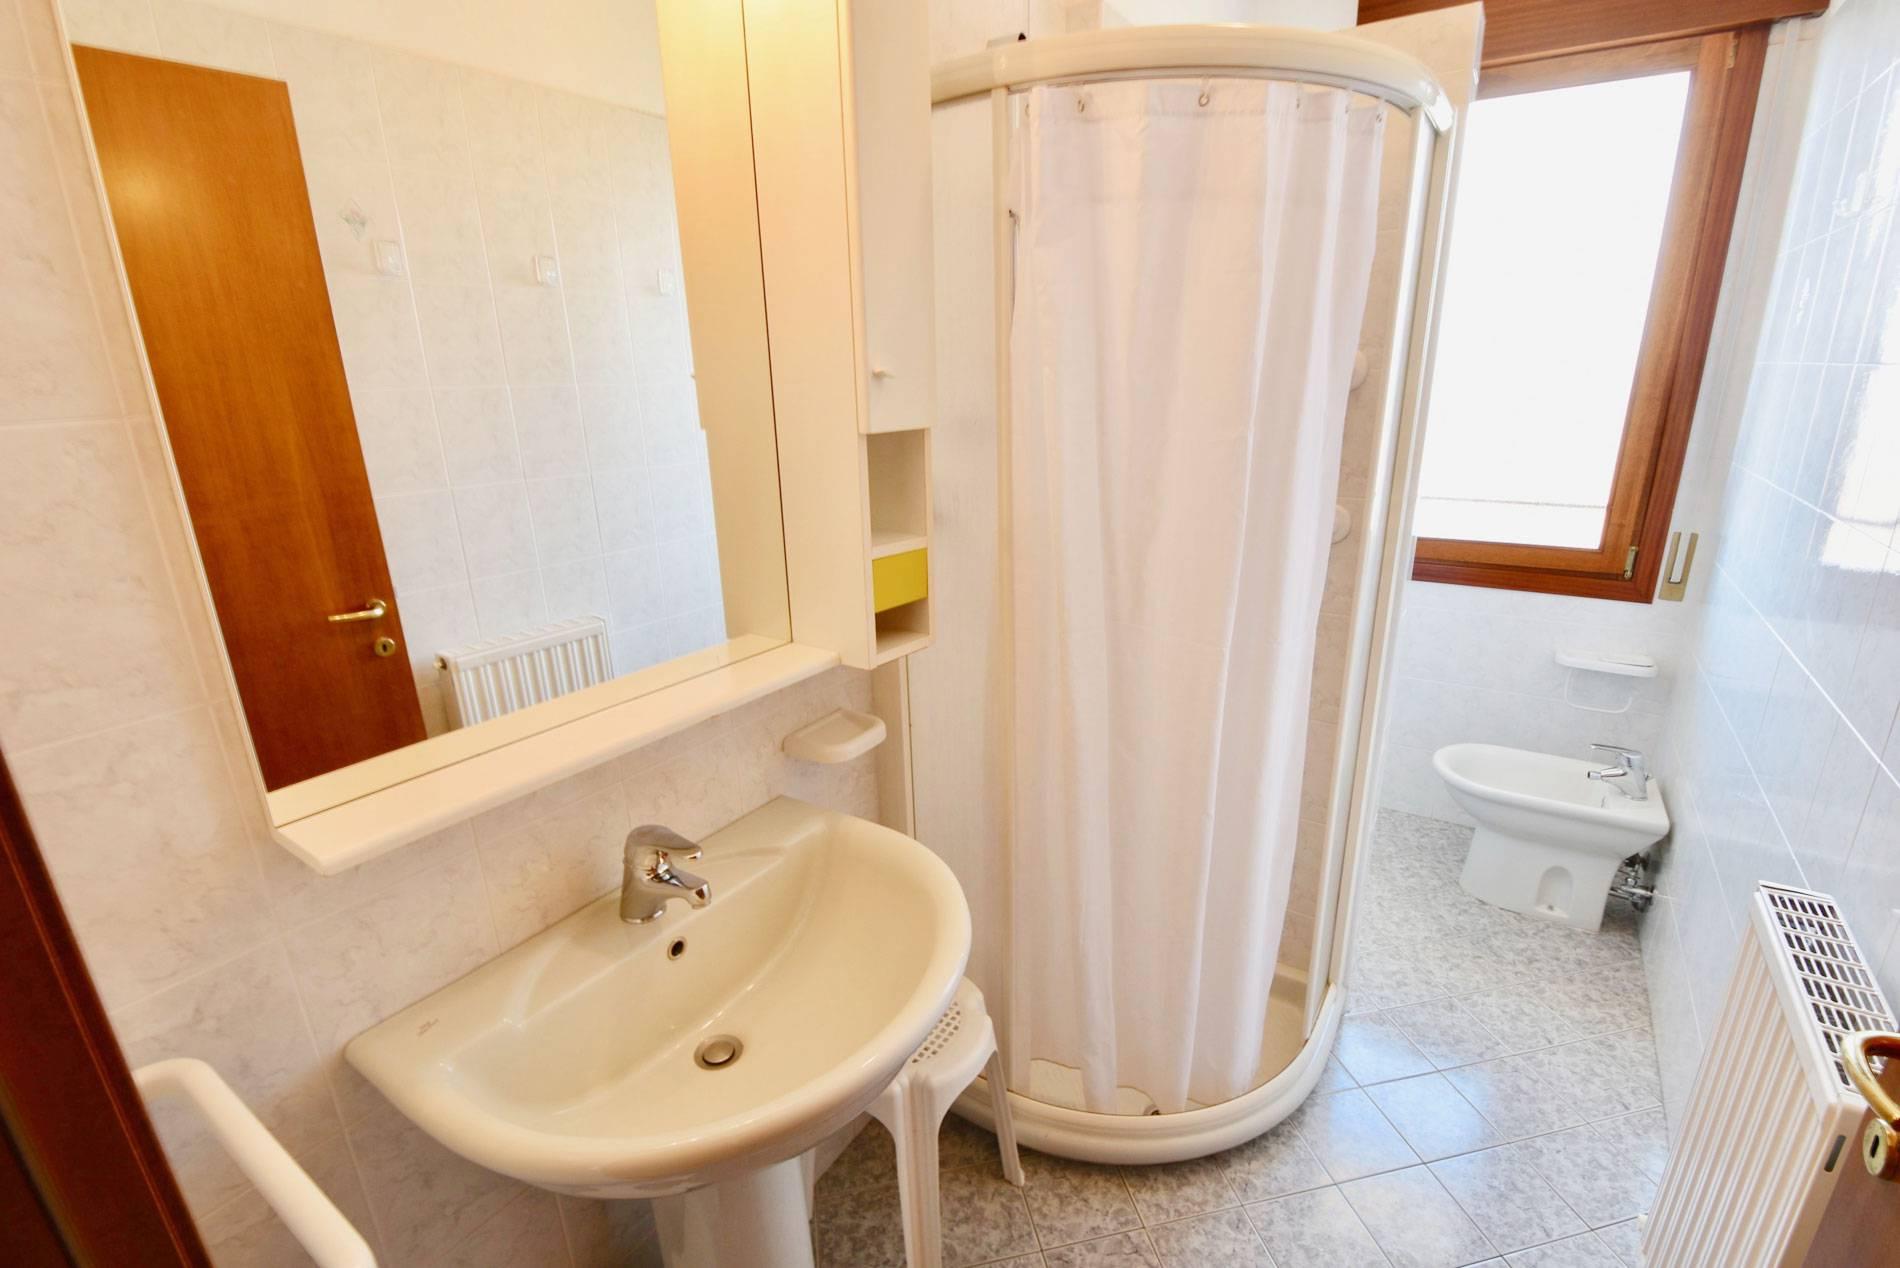 bagno-appartamento-residenc-673106237